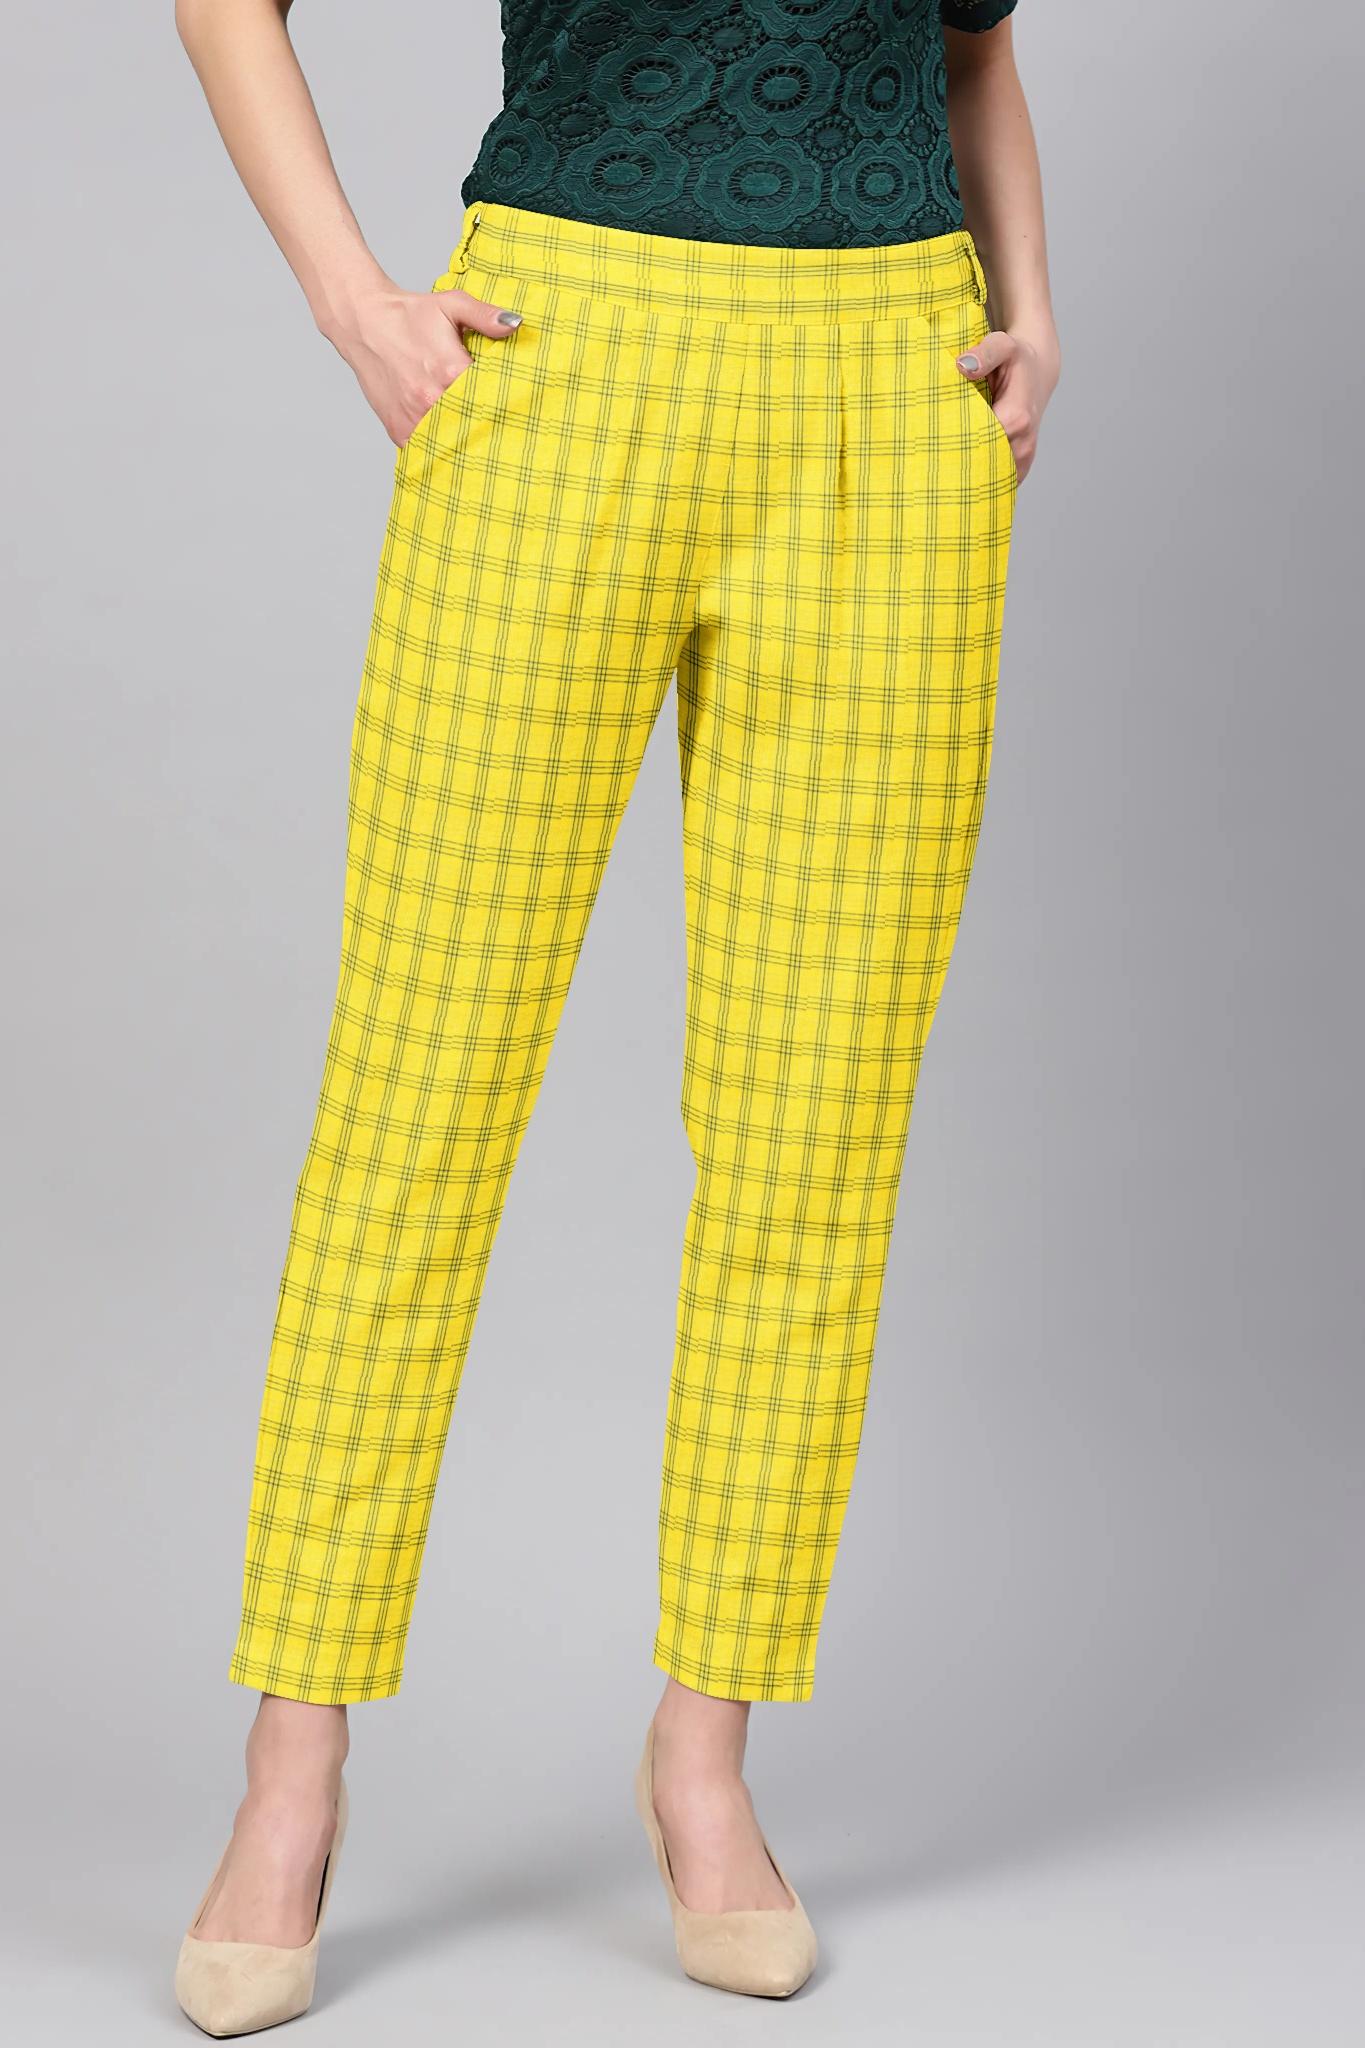 /home/customer/www/fabartcraft.com/public_html/uploadshttps://www.shopolics.com/uploads/images/medium/Yellow-Black-Cotton-Check-Regular-Fit-Solid-Trouser-36097.jpg